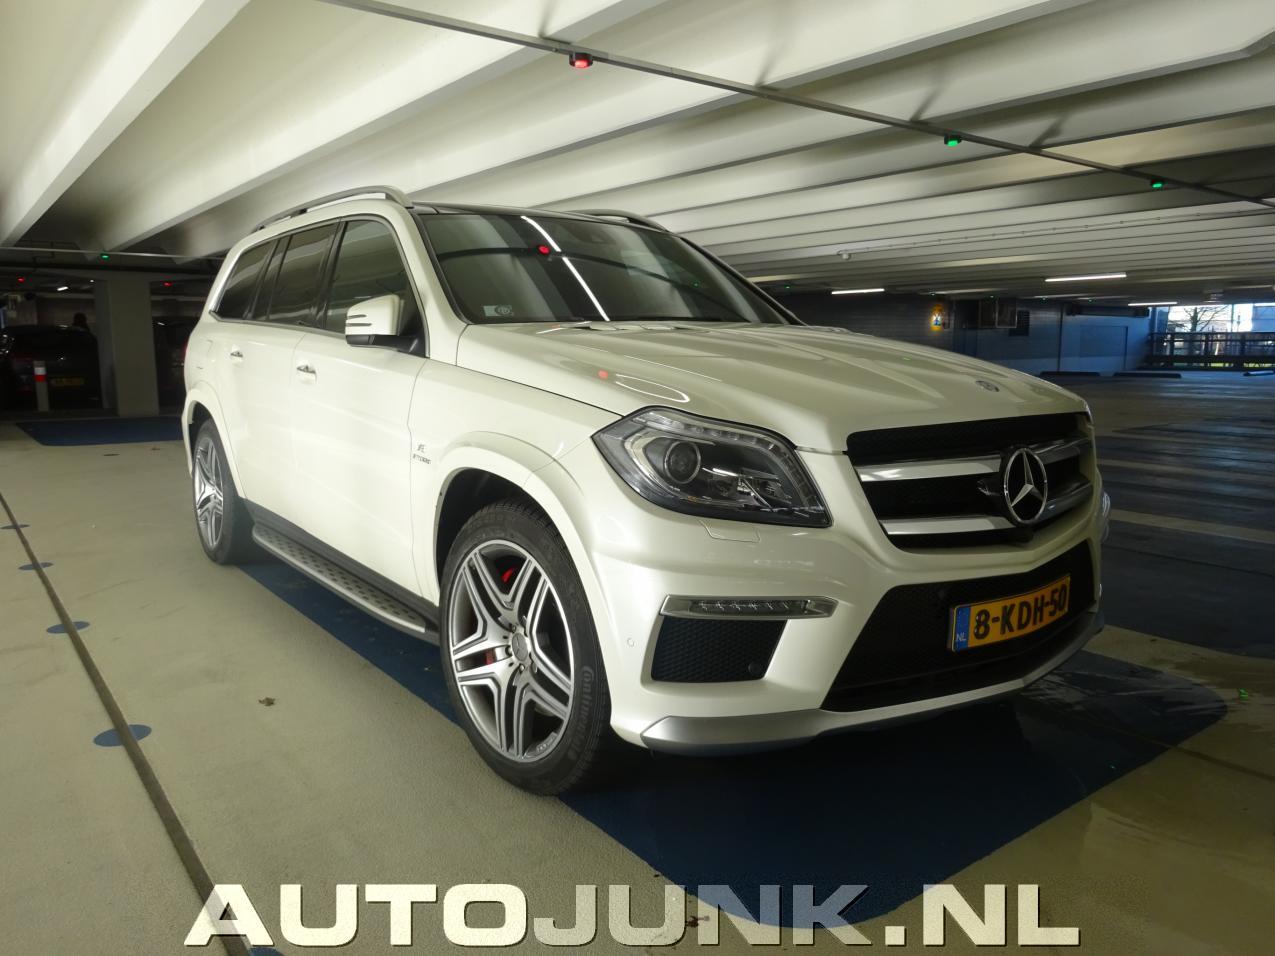 Mercedes benz gl 63 amg x166 foto 39 s 132072 for Mercedes benz gl amg 2015